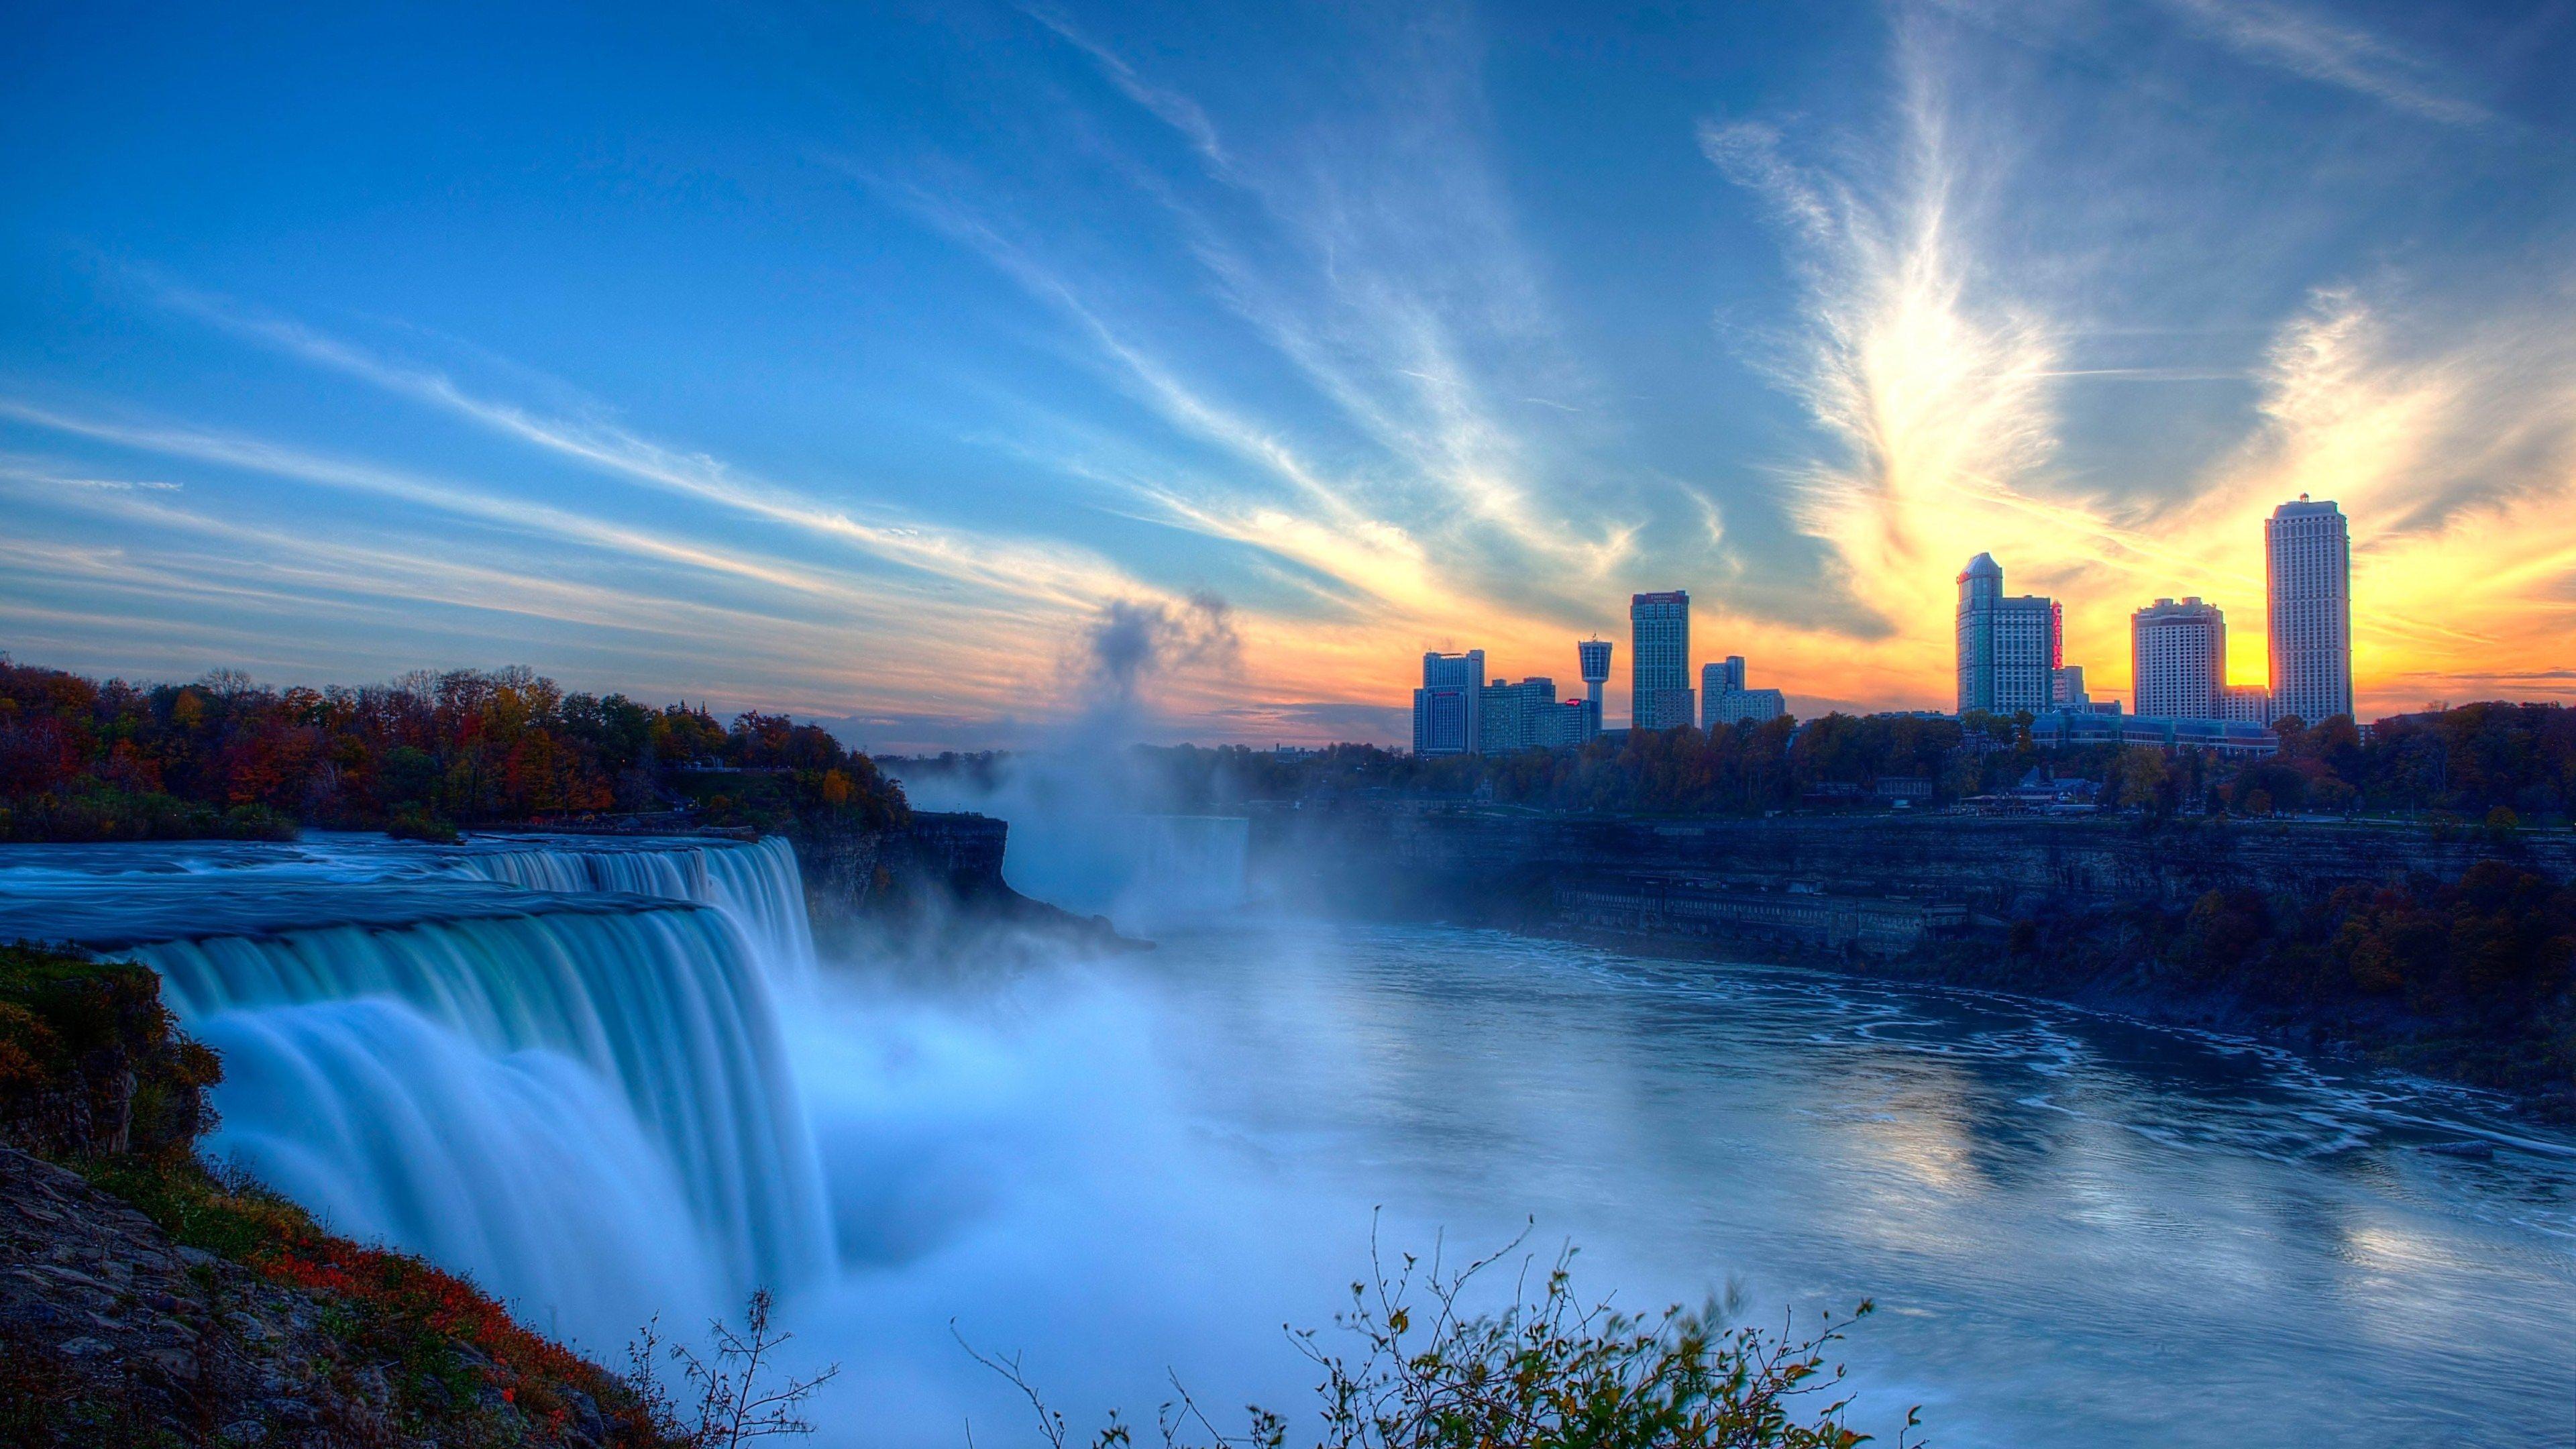 Beautiful Niagara Falls Wallpaper Waterfall Wallpaper High Quality Pixelstalk Net